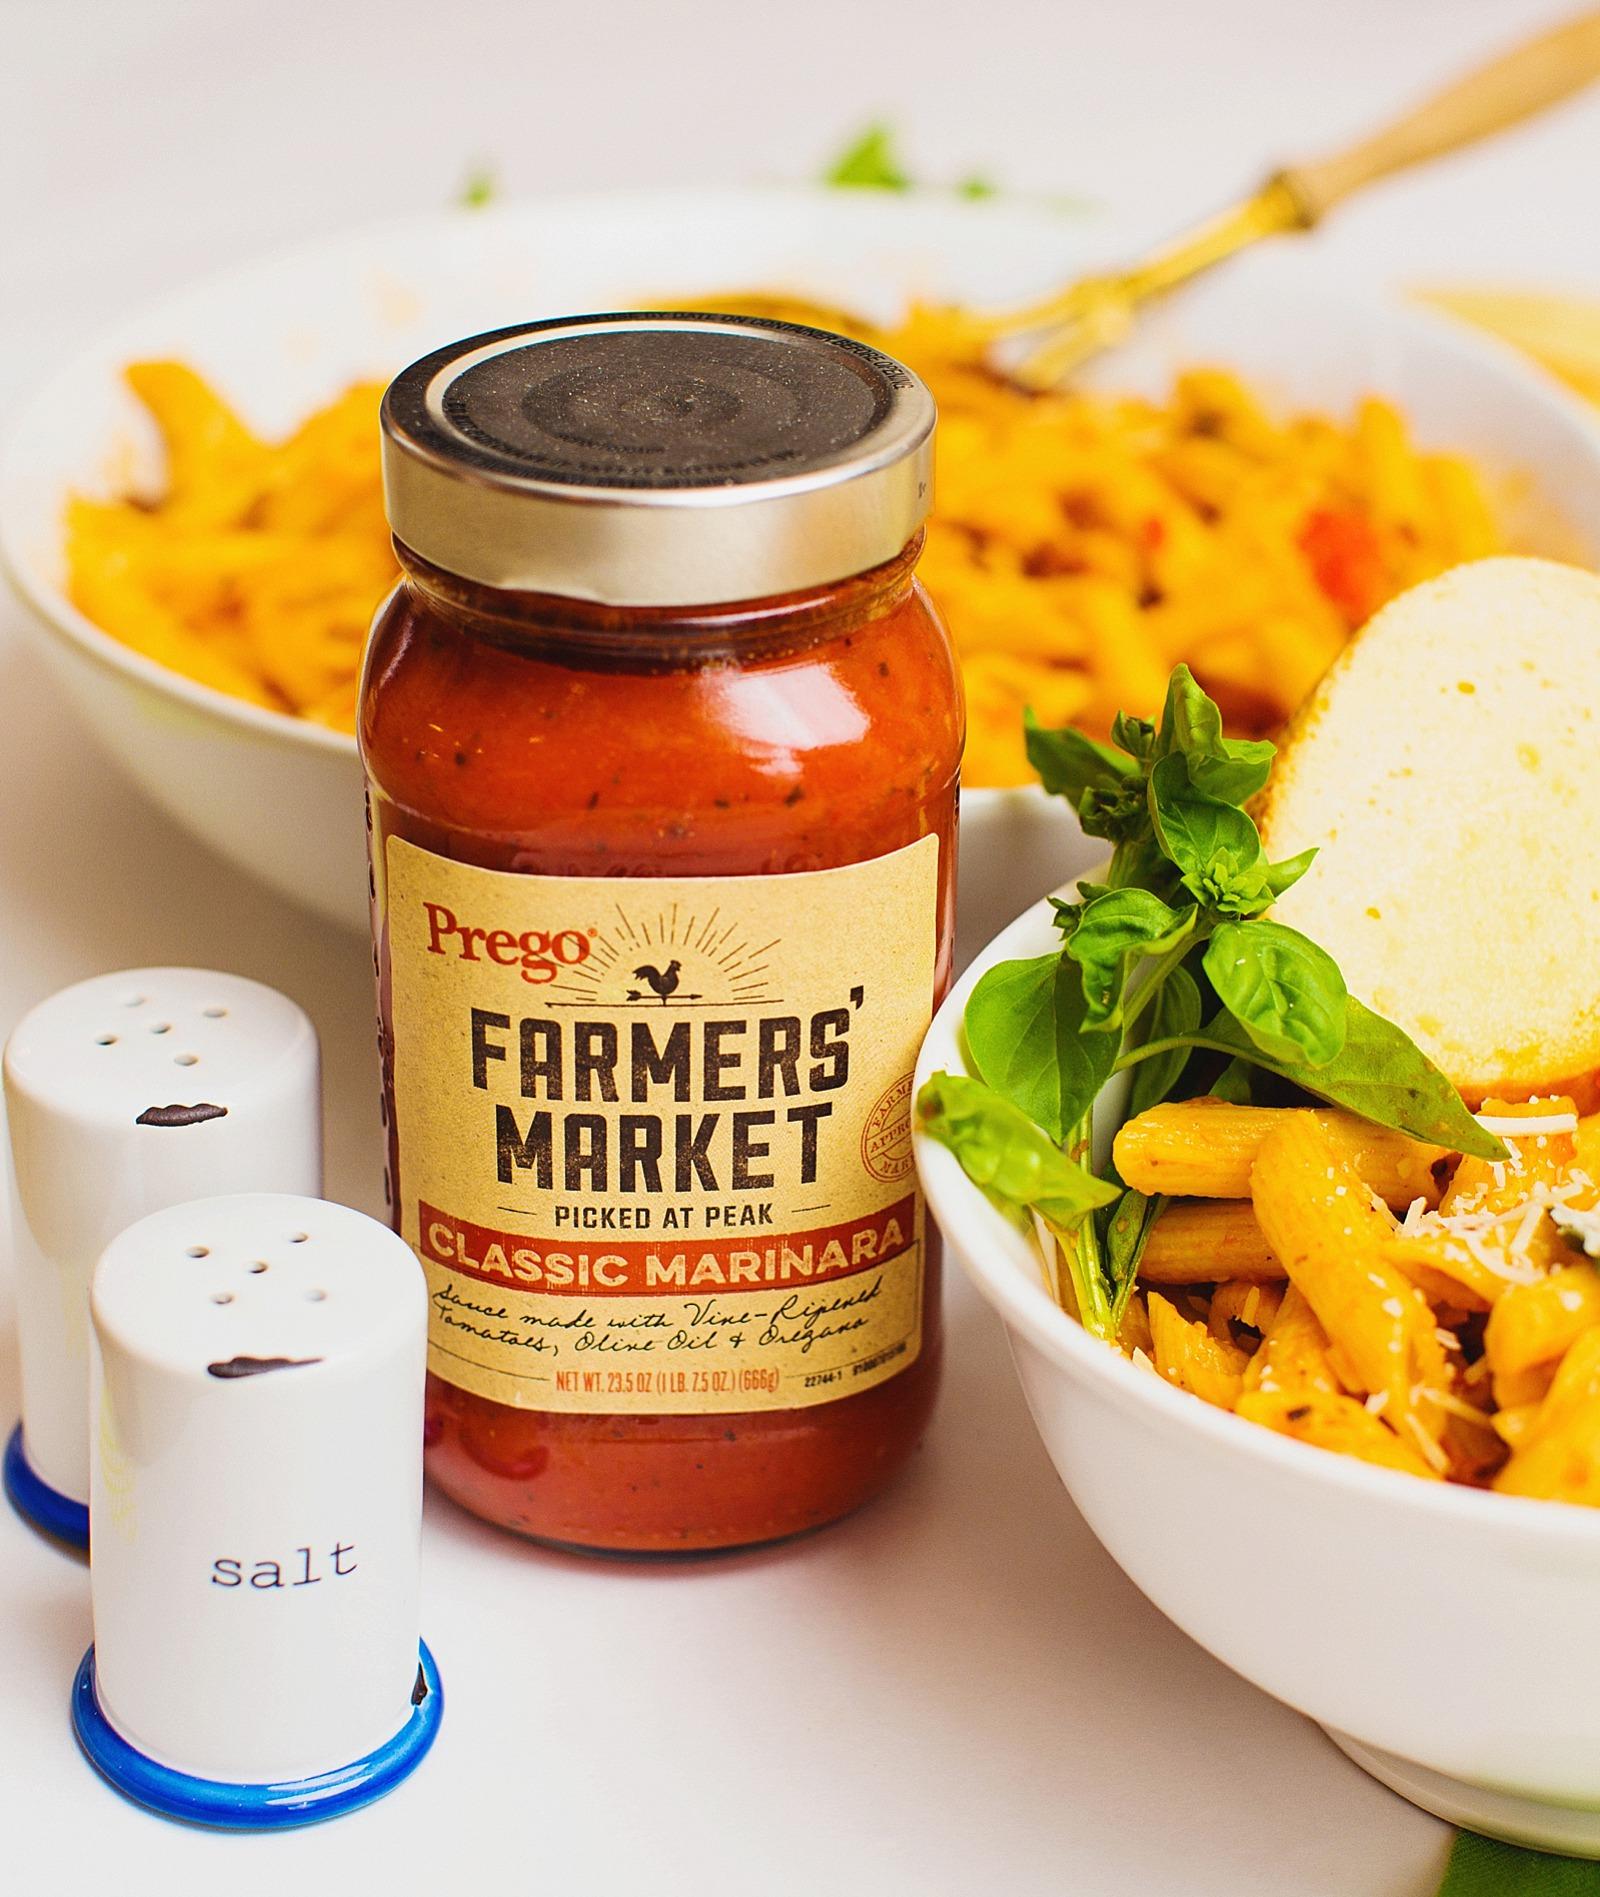 prego-farmers-market-recipe-penne-italian-sausage-basil-352